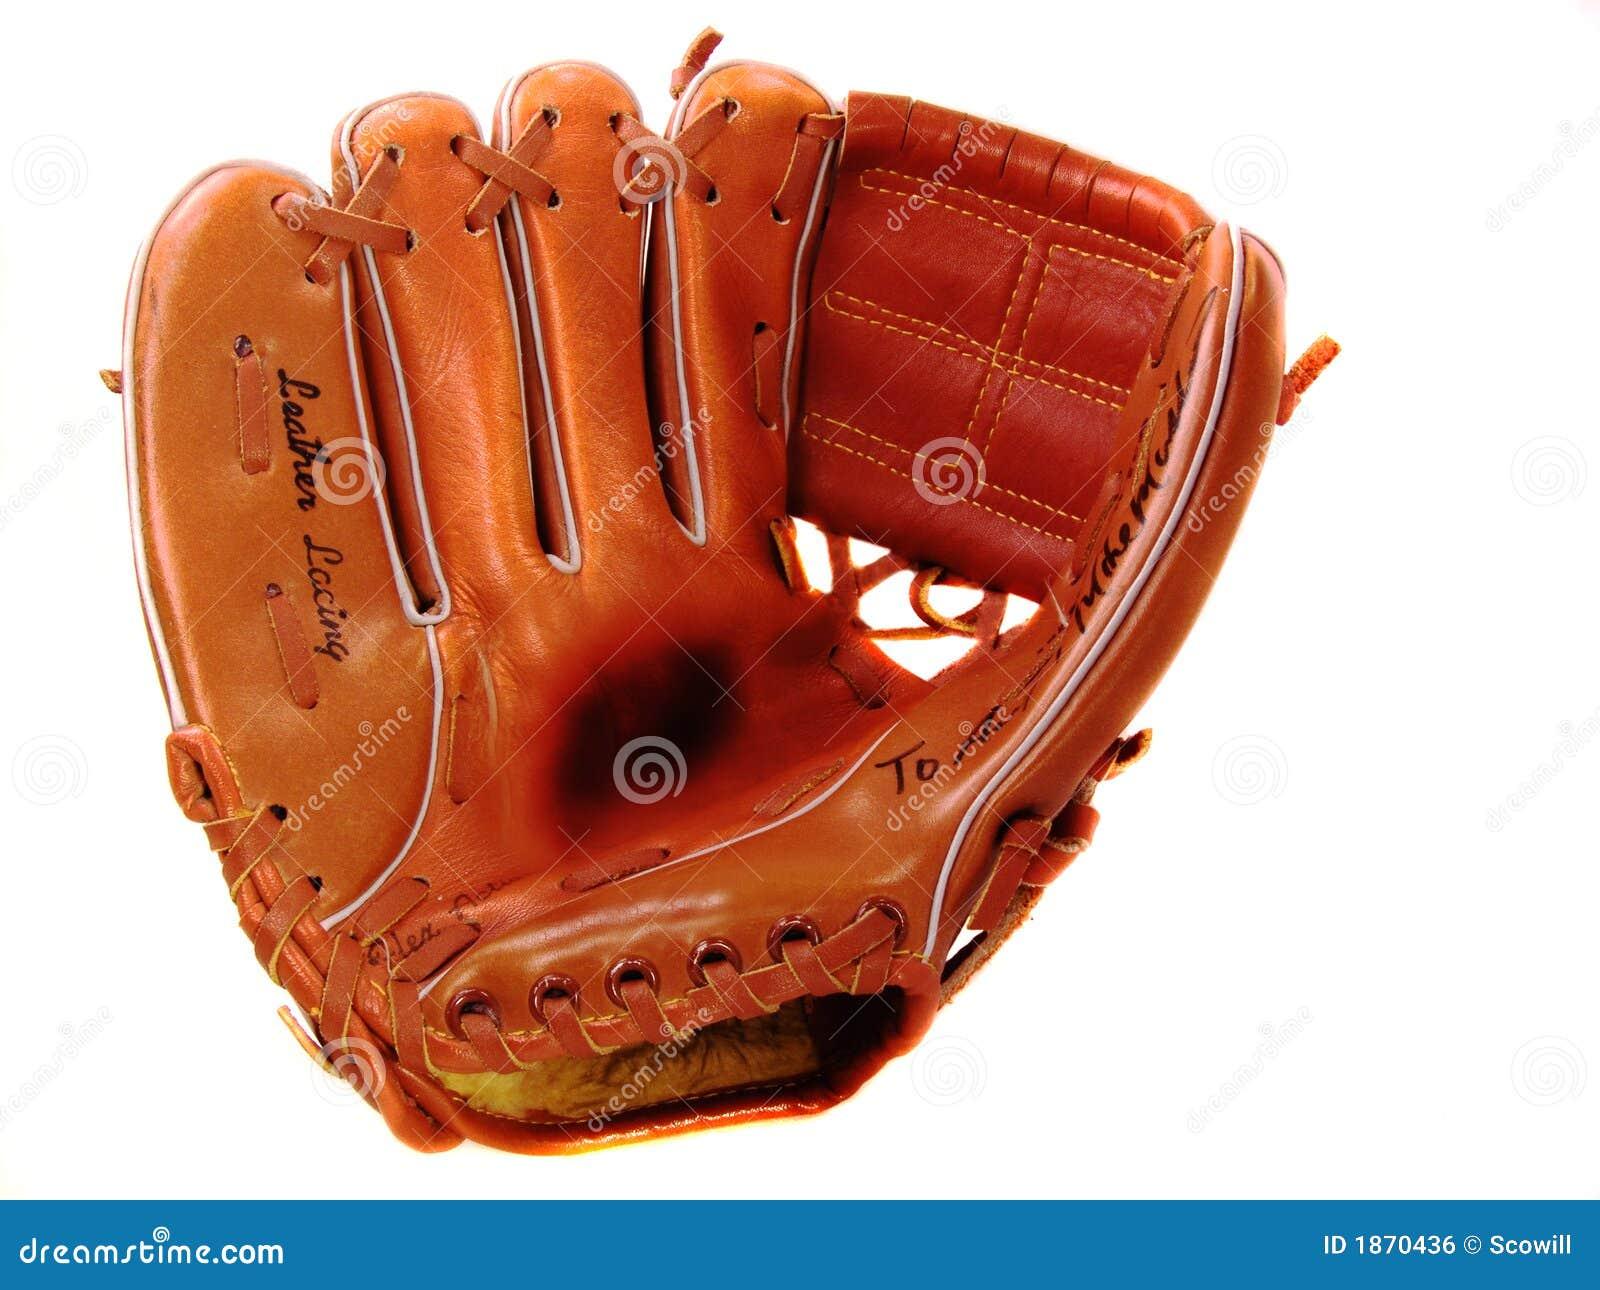 Child's Lefty Baseball Glove Stock Photo